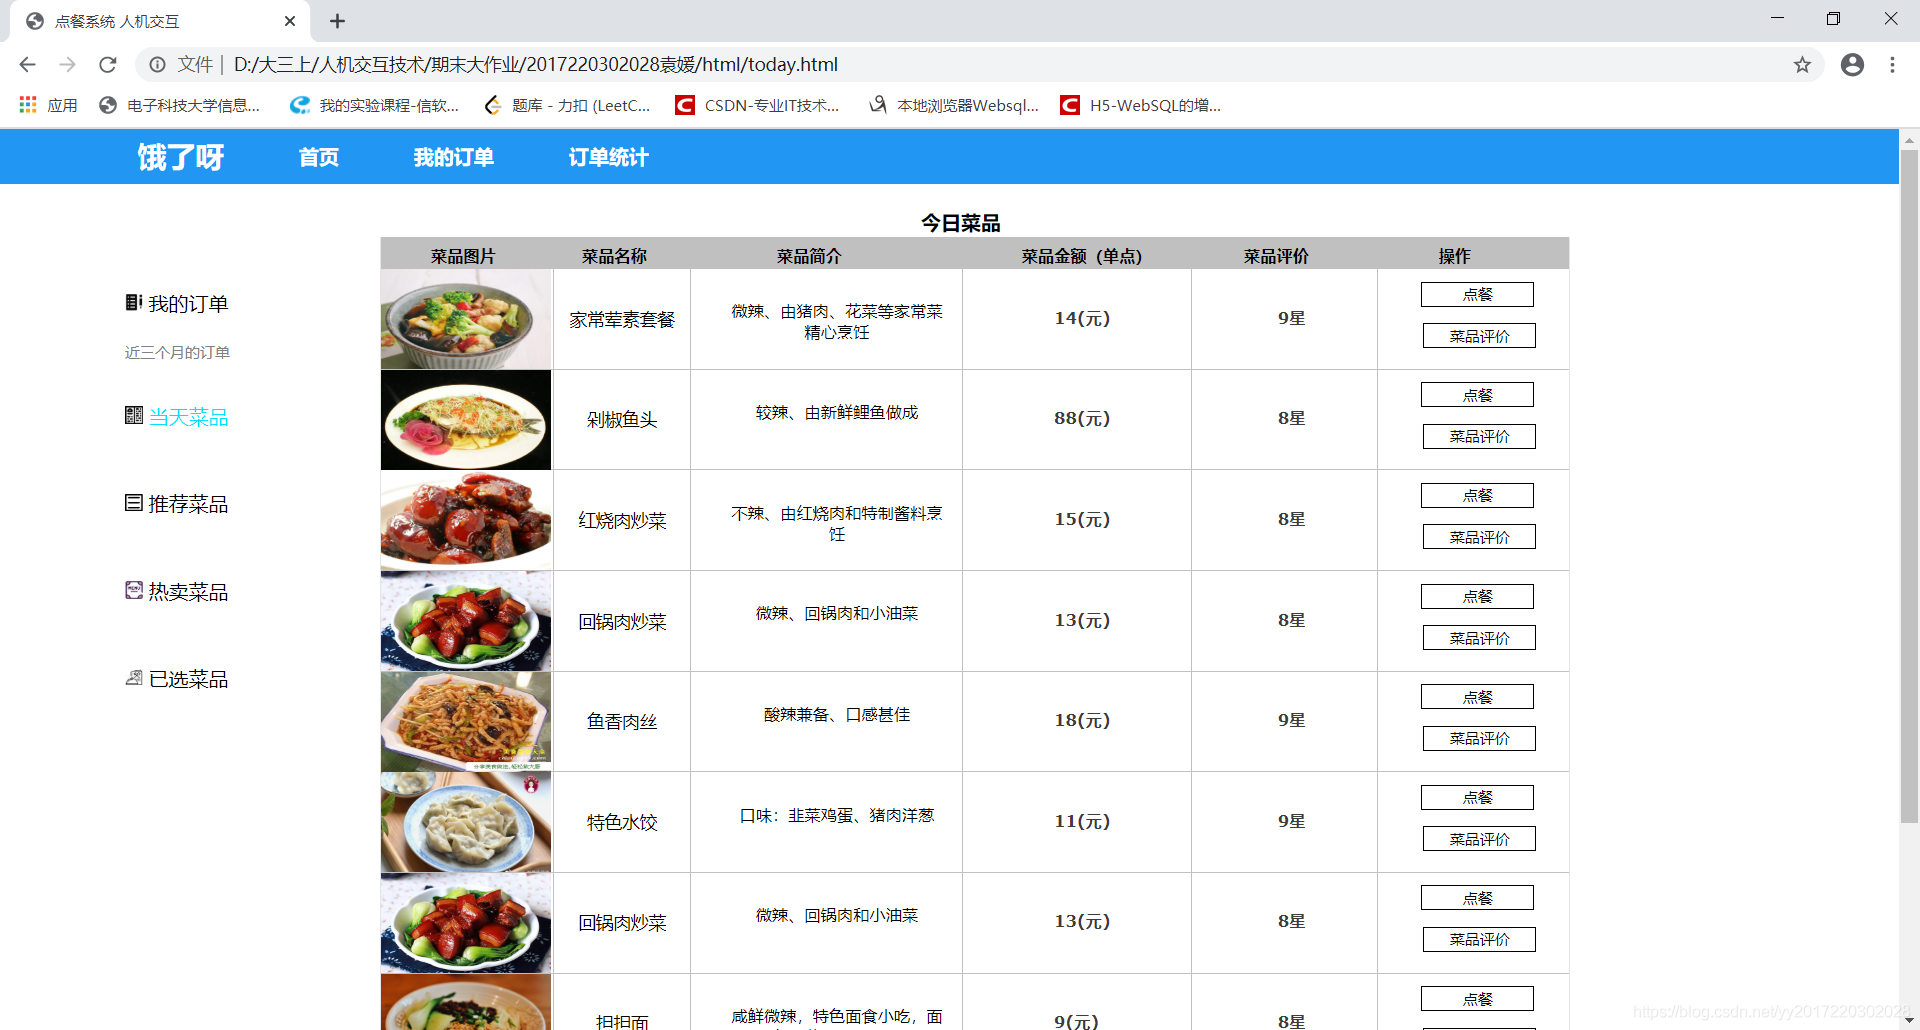 html5网站源码下载 定单(html5网站源码带后台) (https://www.oilcn.net.cn/) 综合教程 第2张